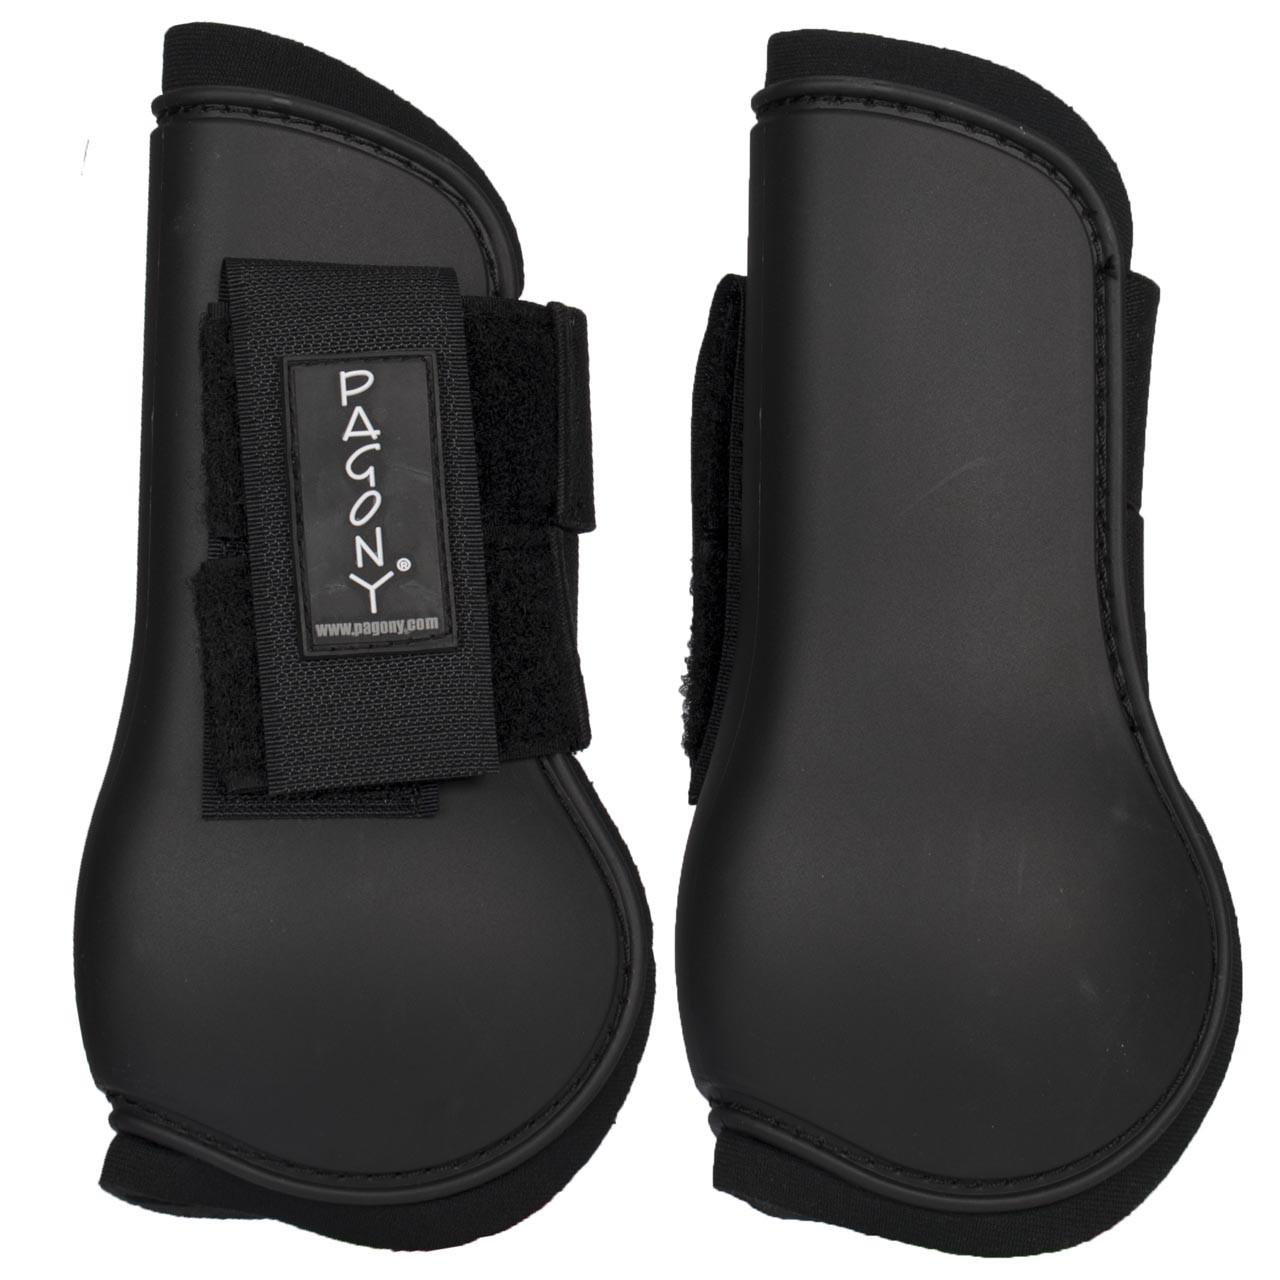 Pagony Mini peesbeschermers zwart maat:shetl